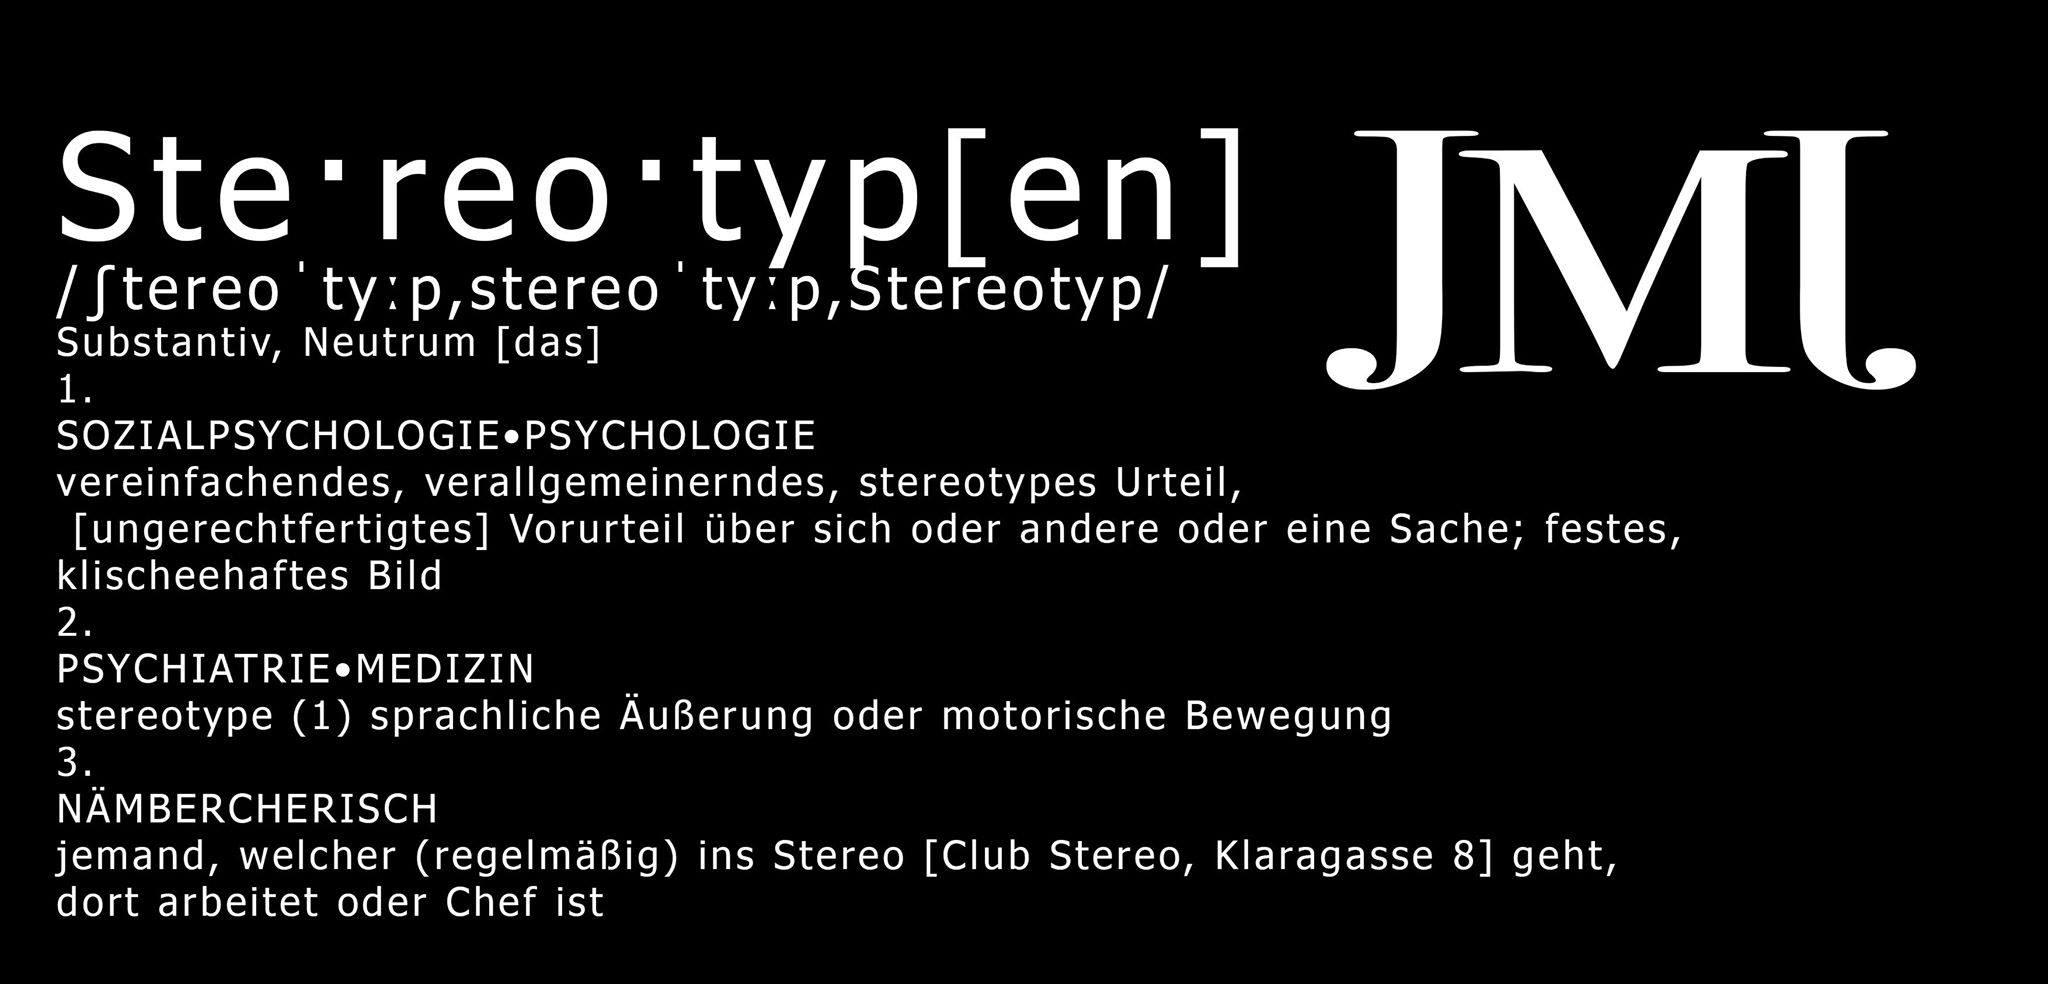 Stereotypen